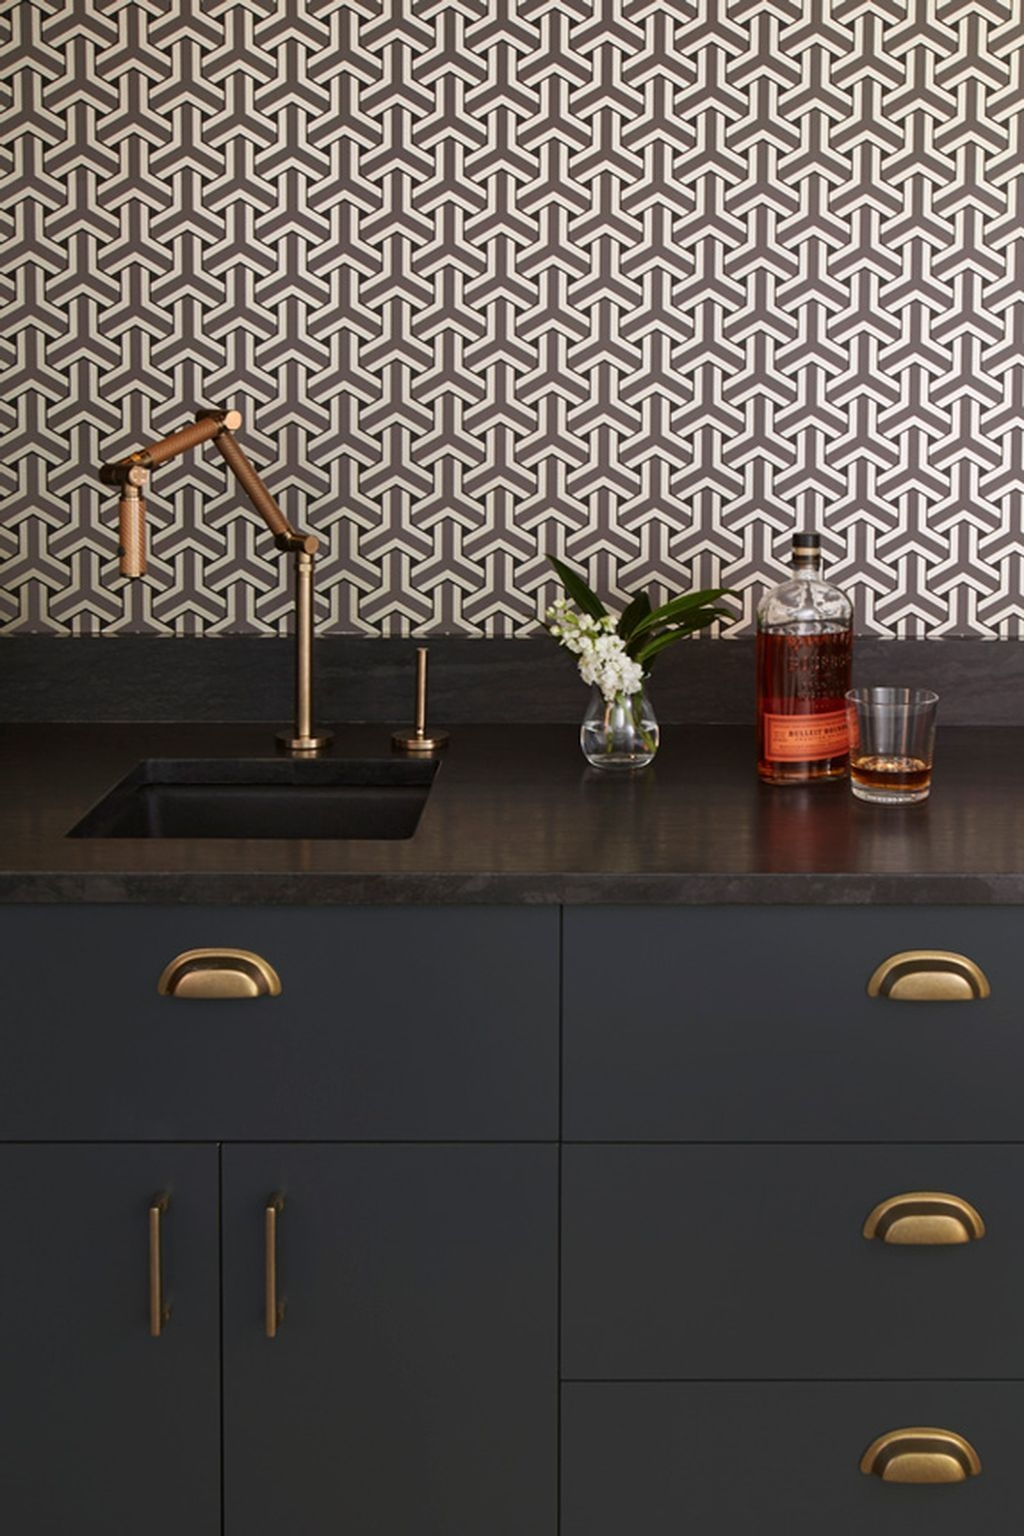 Latest Kitchen Backsplash Tile Ideas13